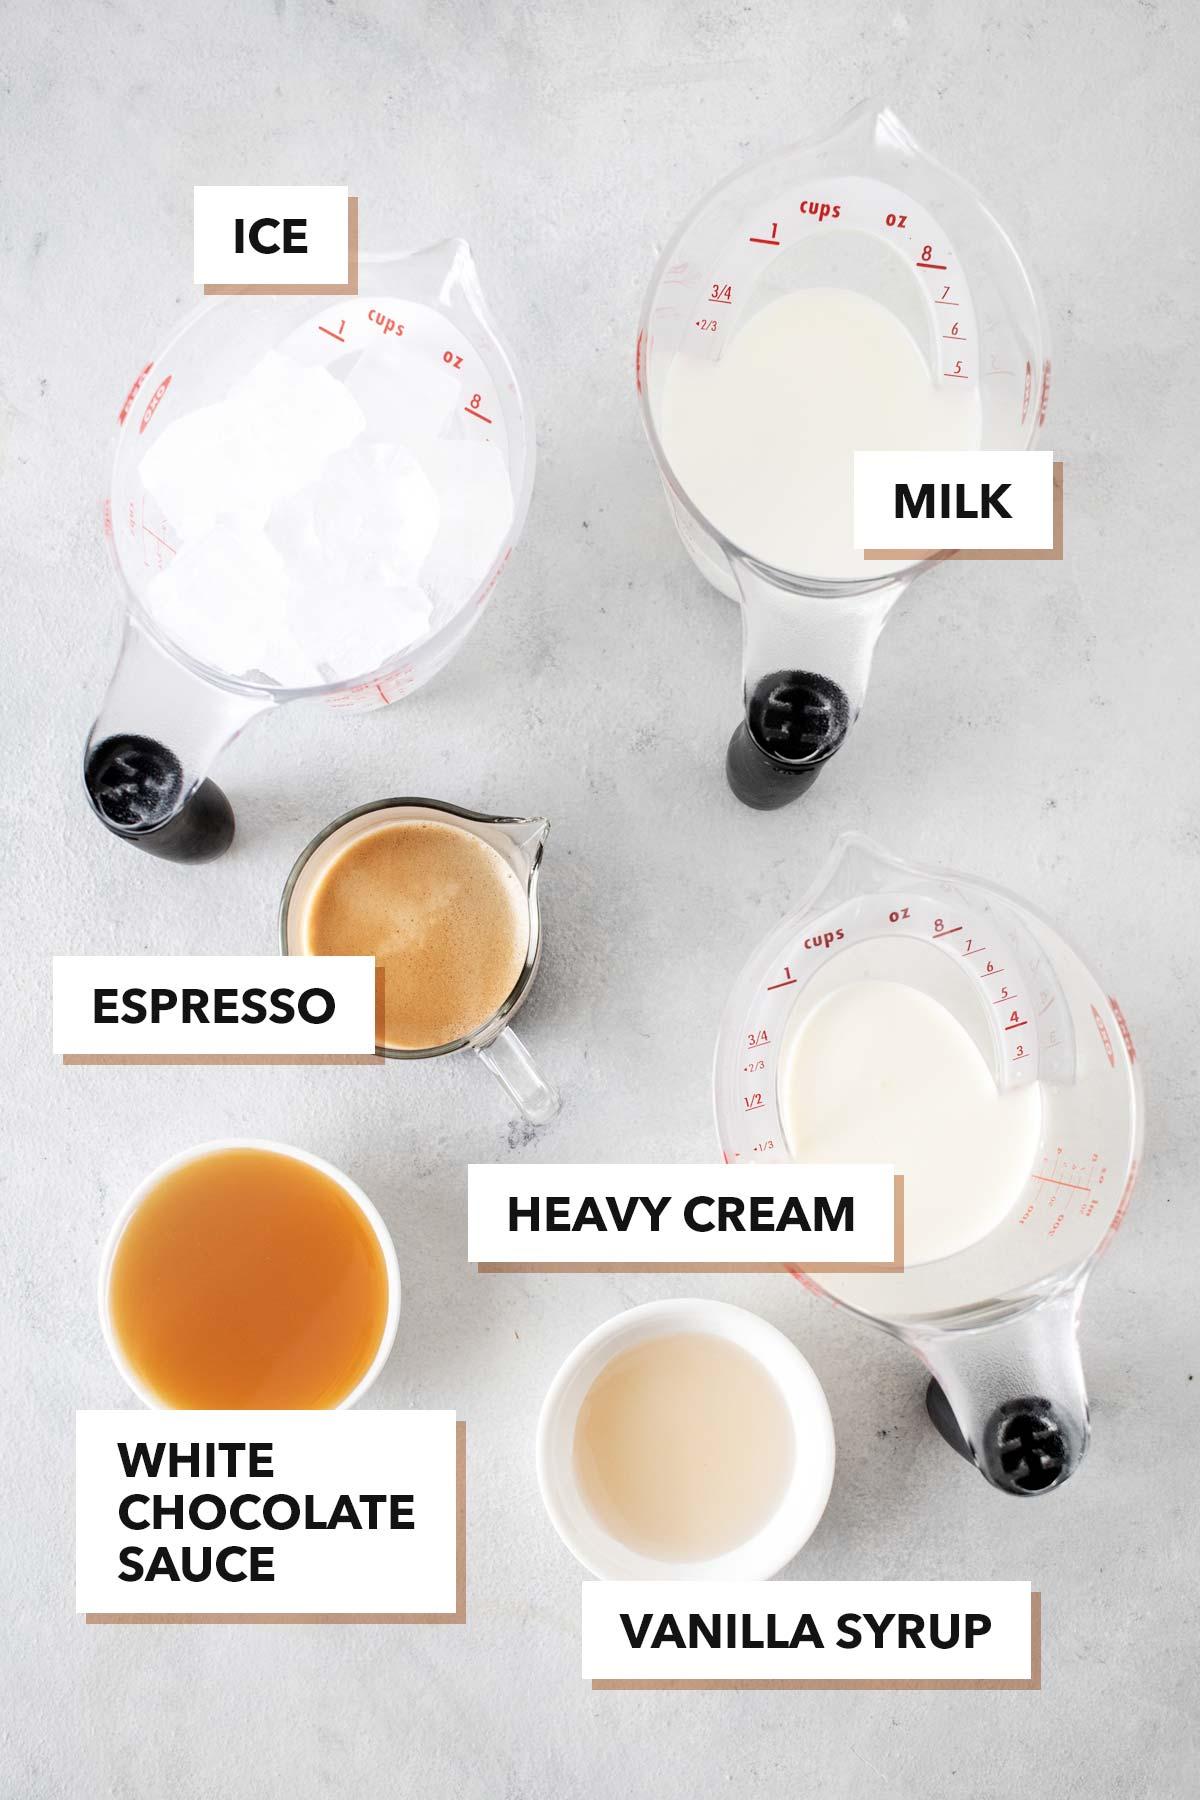 Iced White Chocolate Mocha ingredients.